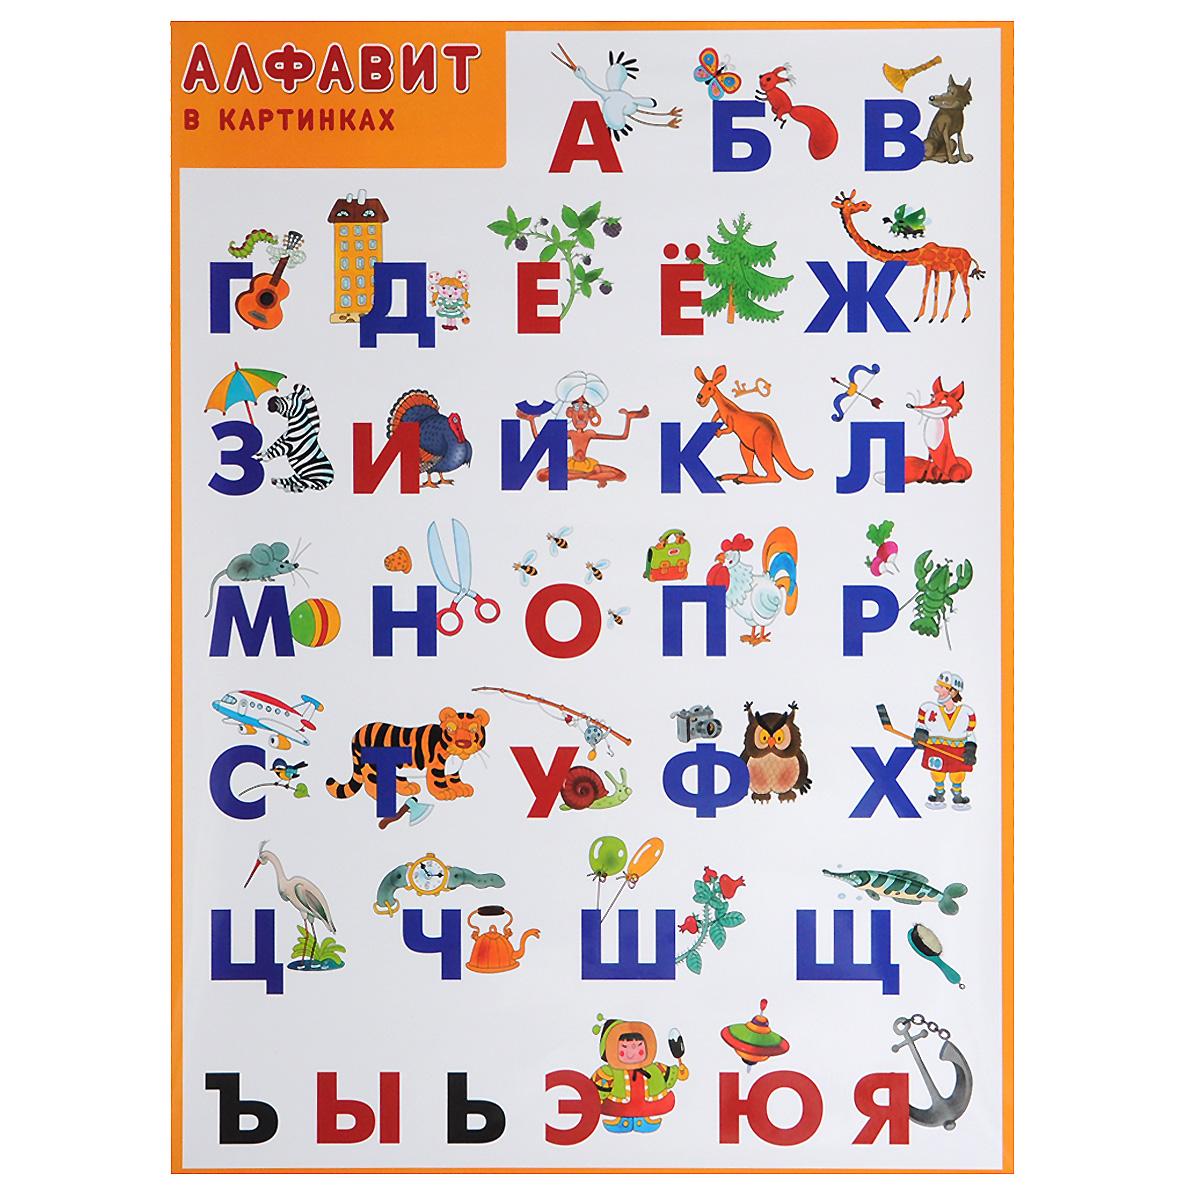 Алфавит в картинках. Плакат